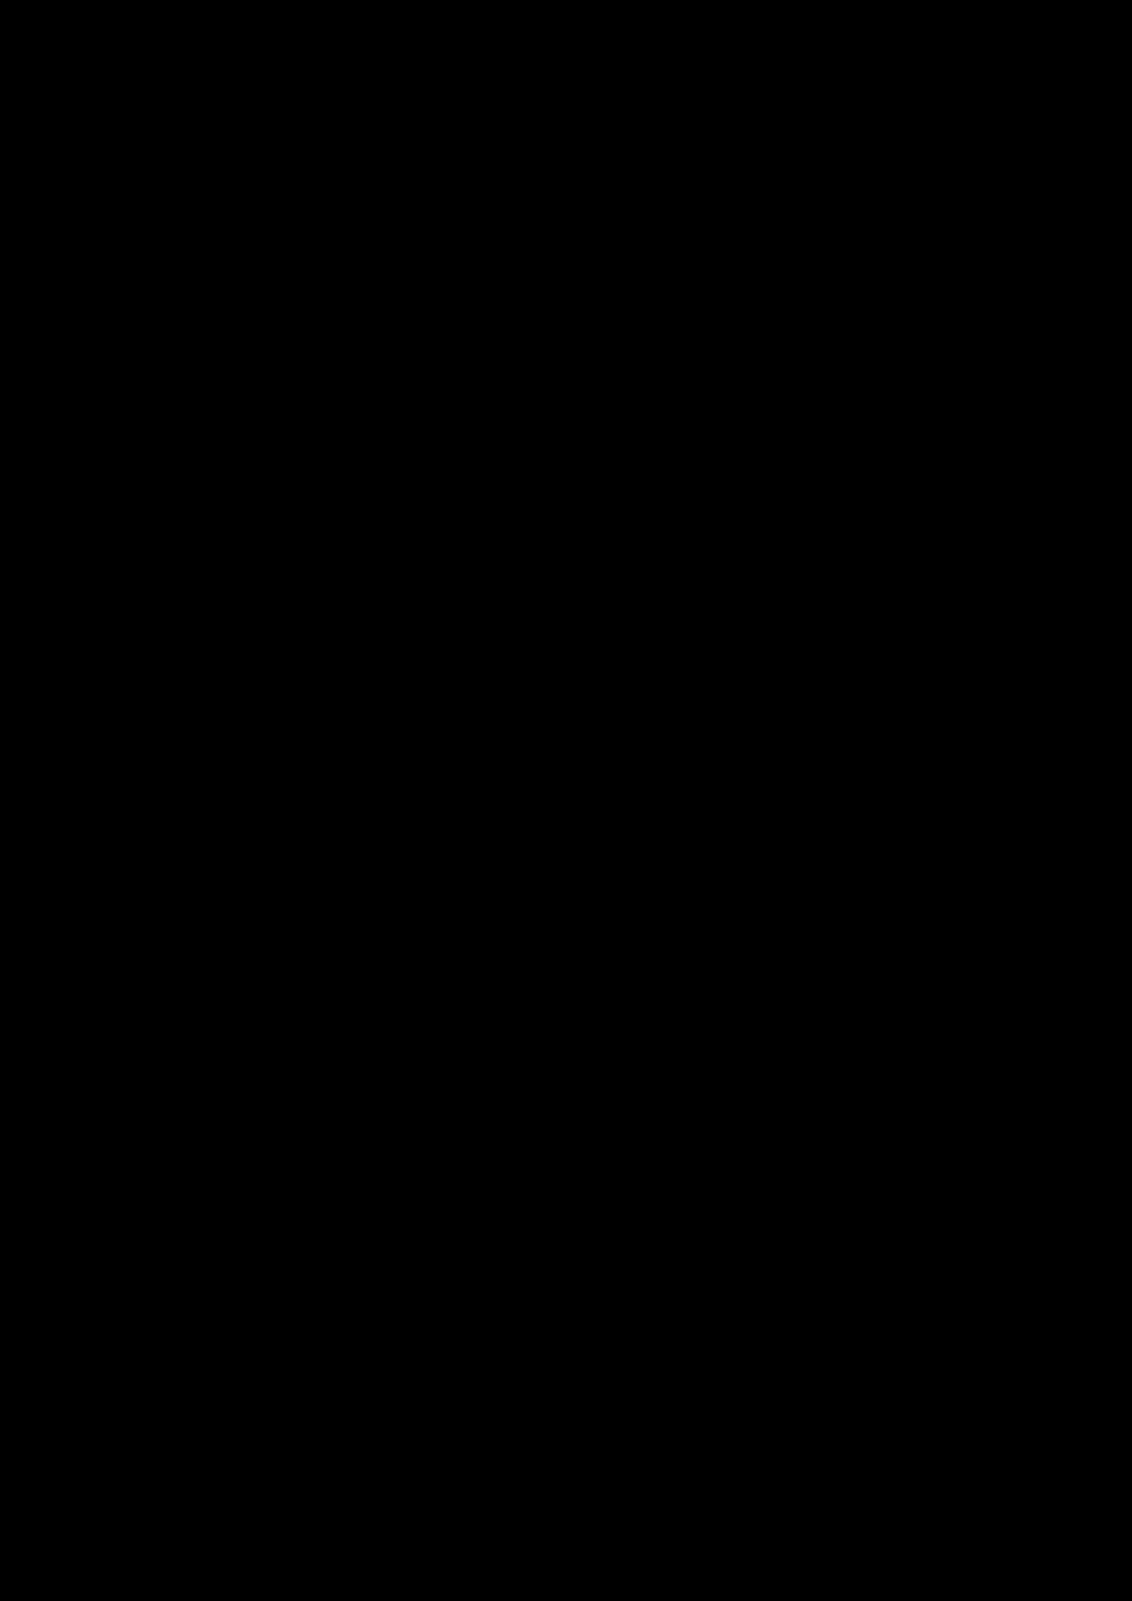 Belyiy sokol slide, Image 71